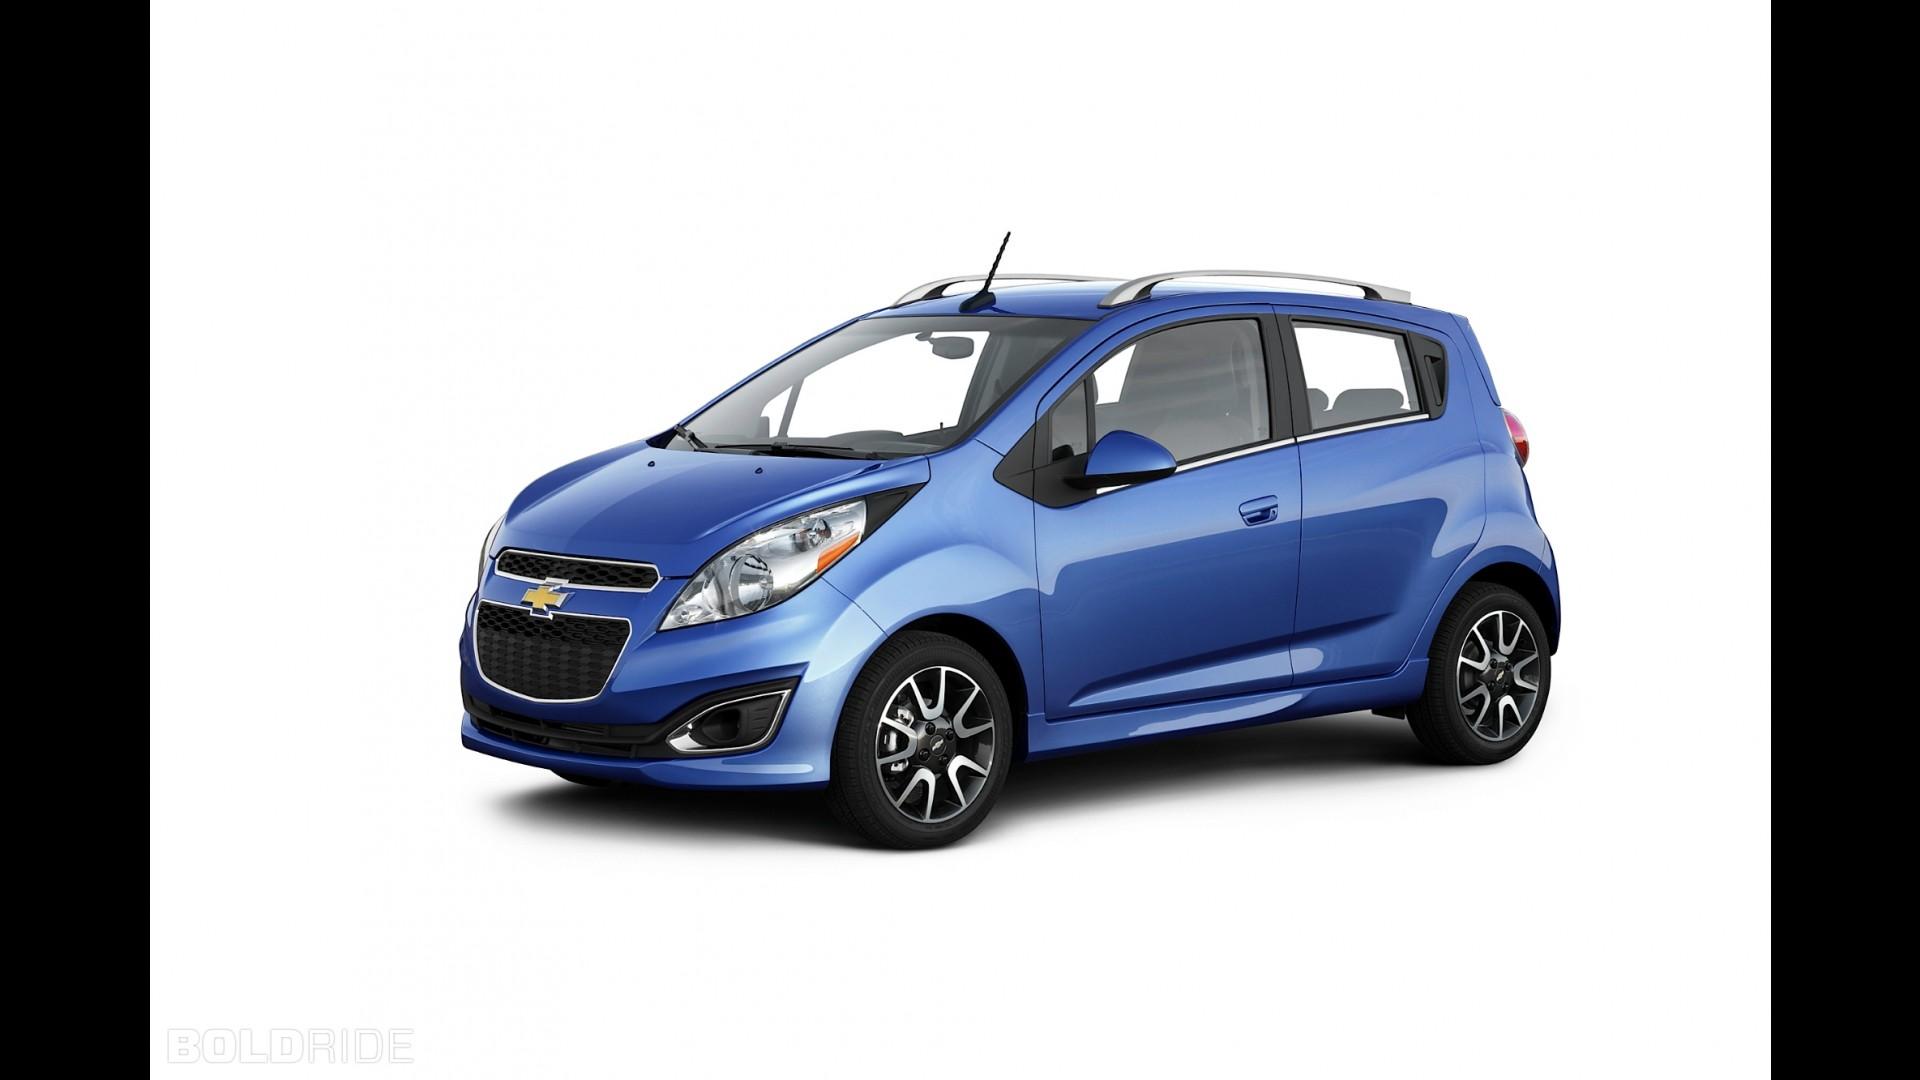 Chevrolet Spark New Car Motors